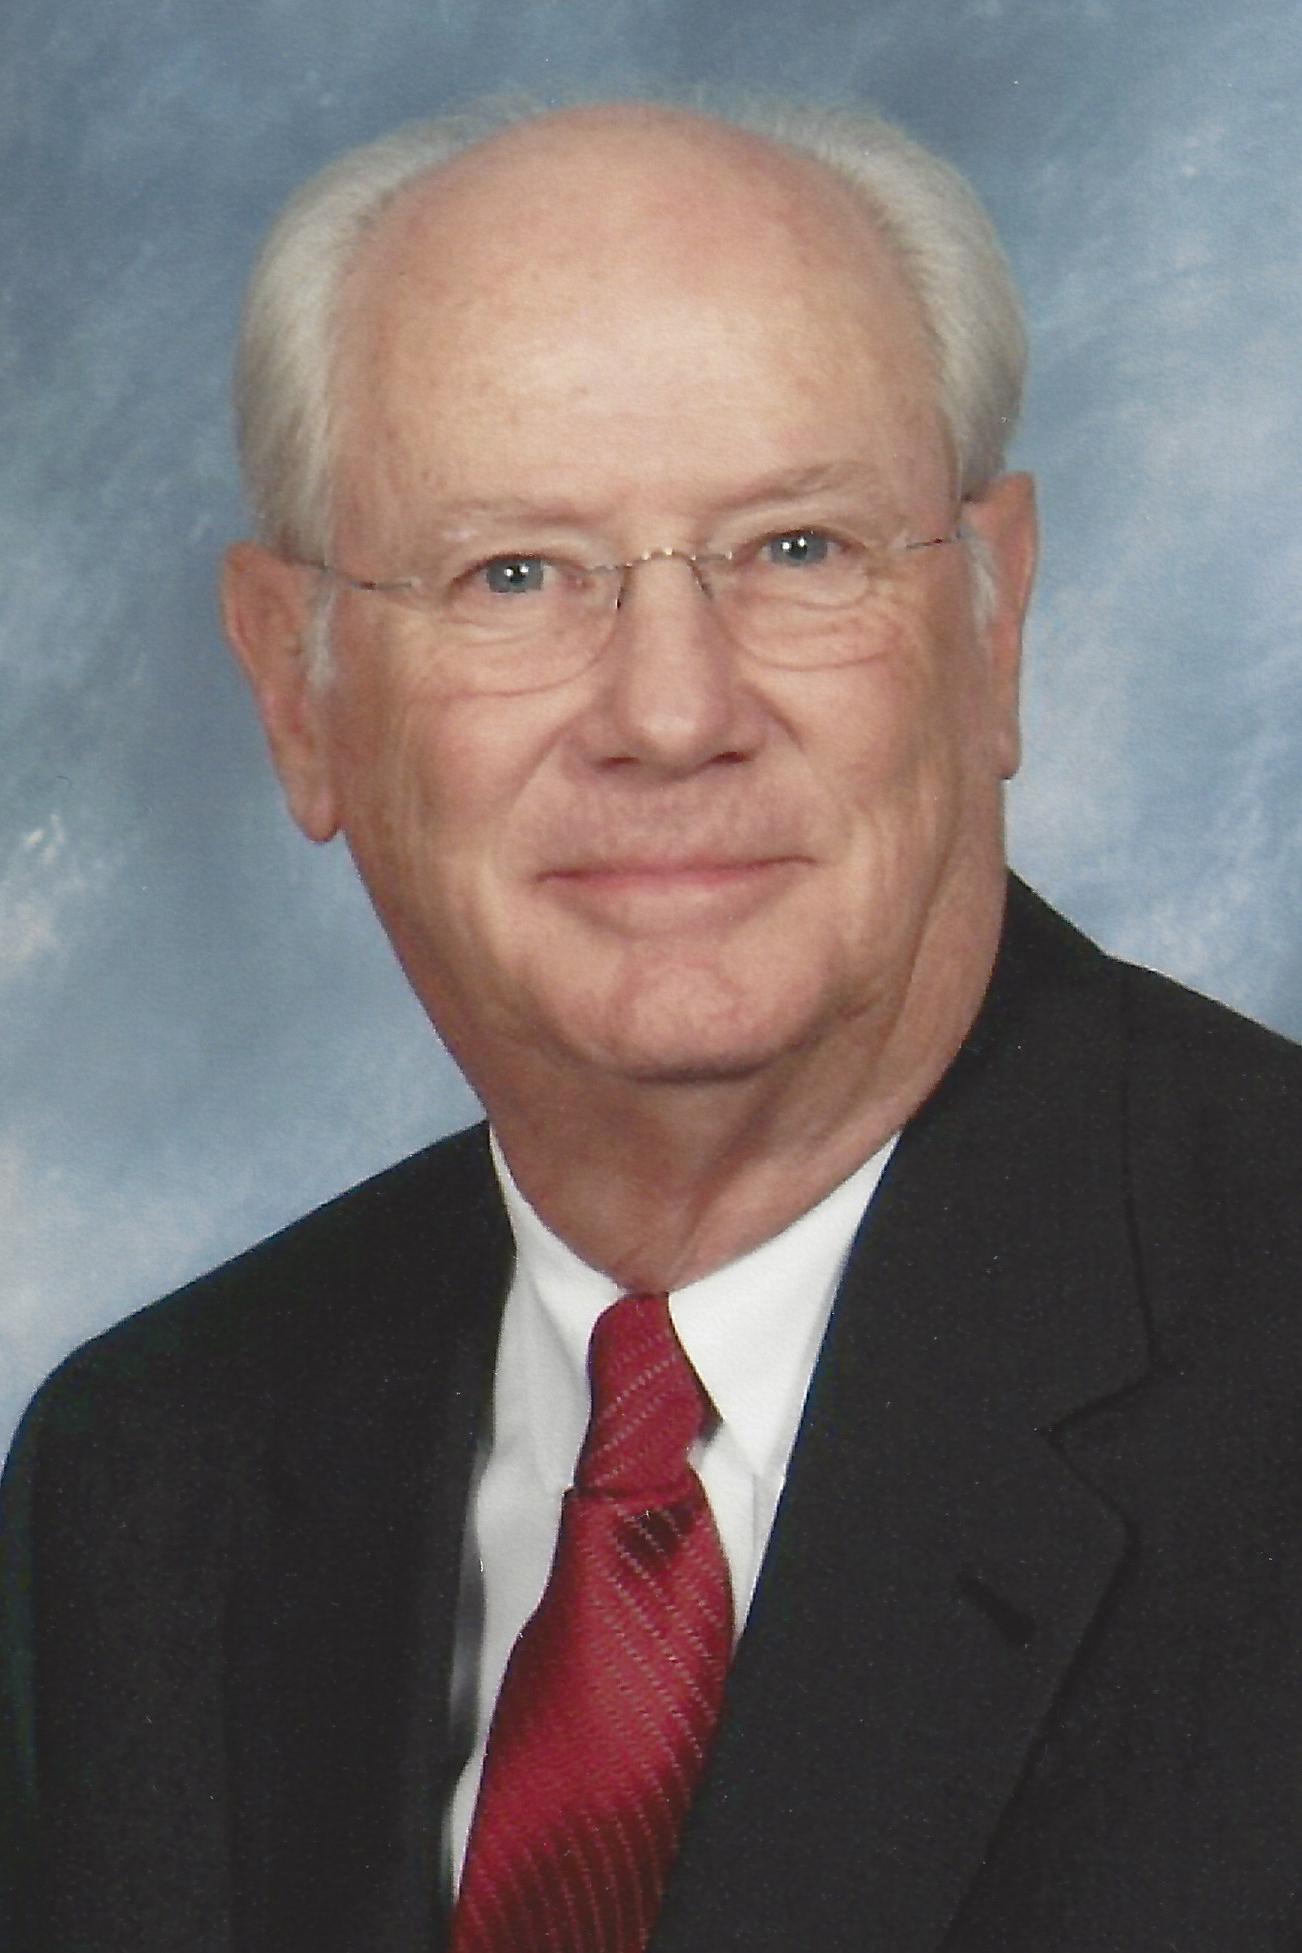 The Rev. James McCormick Photo courtesy of the Rev. McCormick.